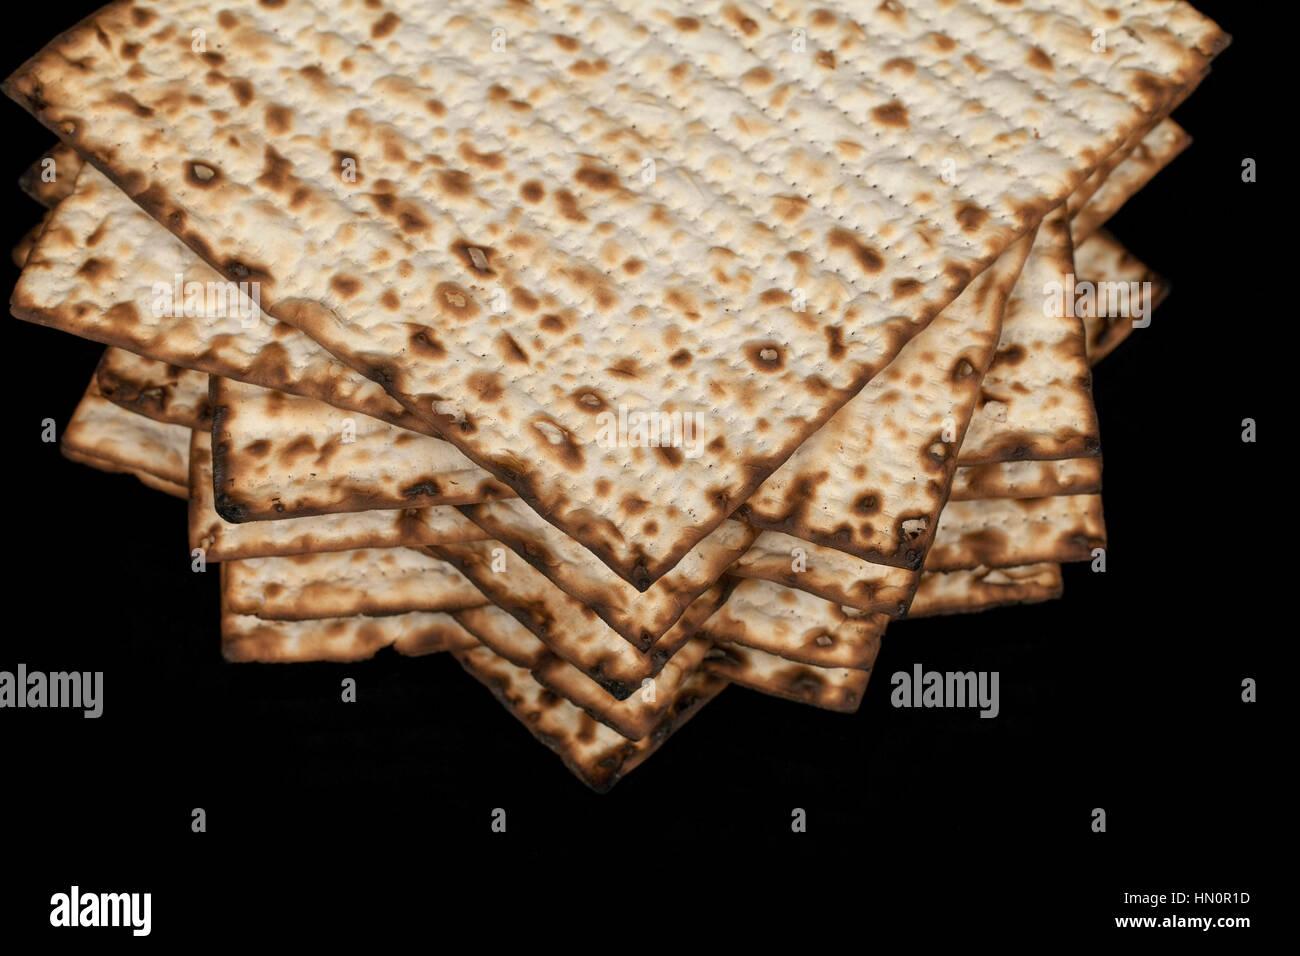 Traditional Jewish matzah on a black background. Close-up - Stock Image